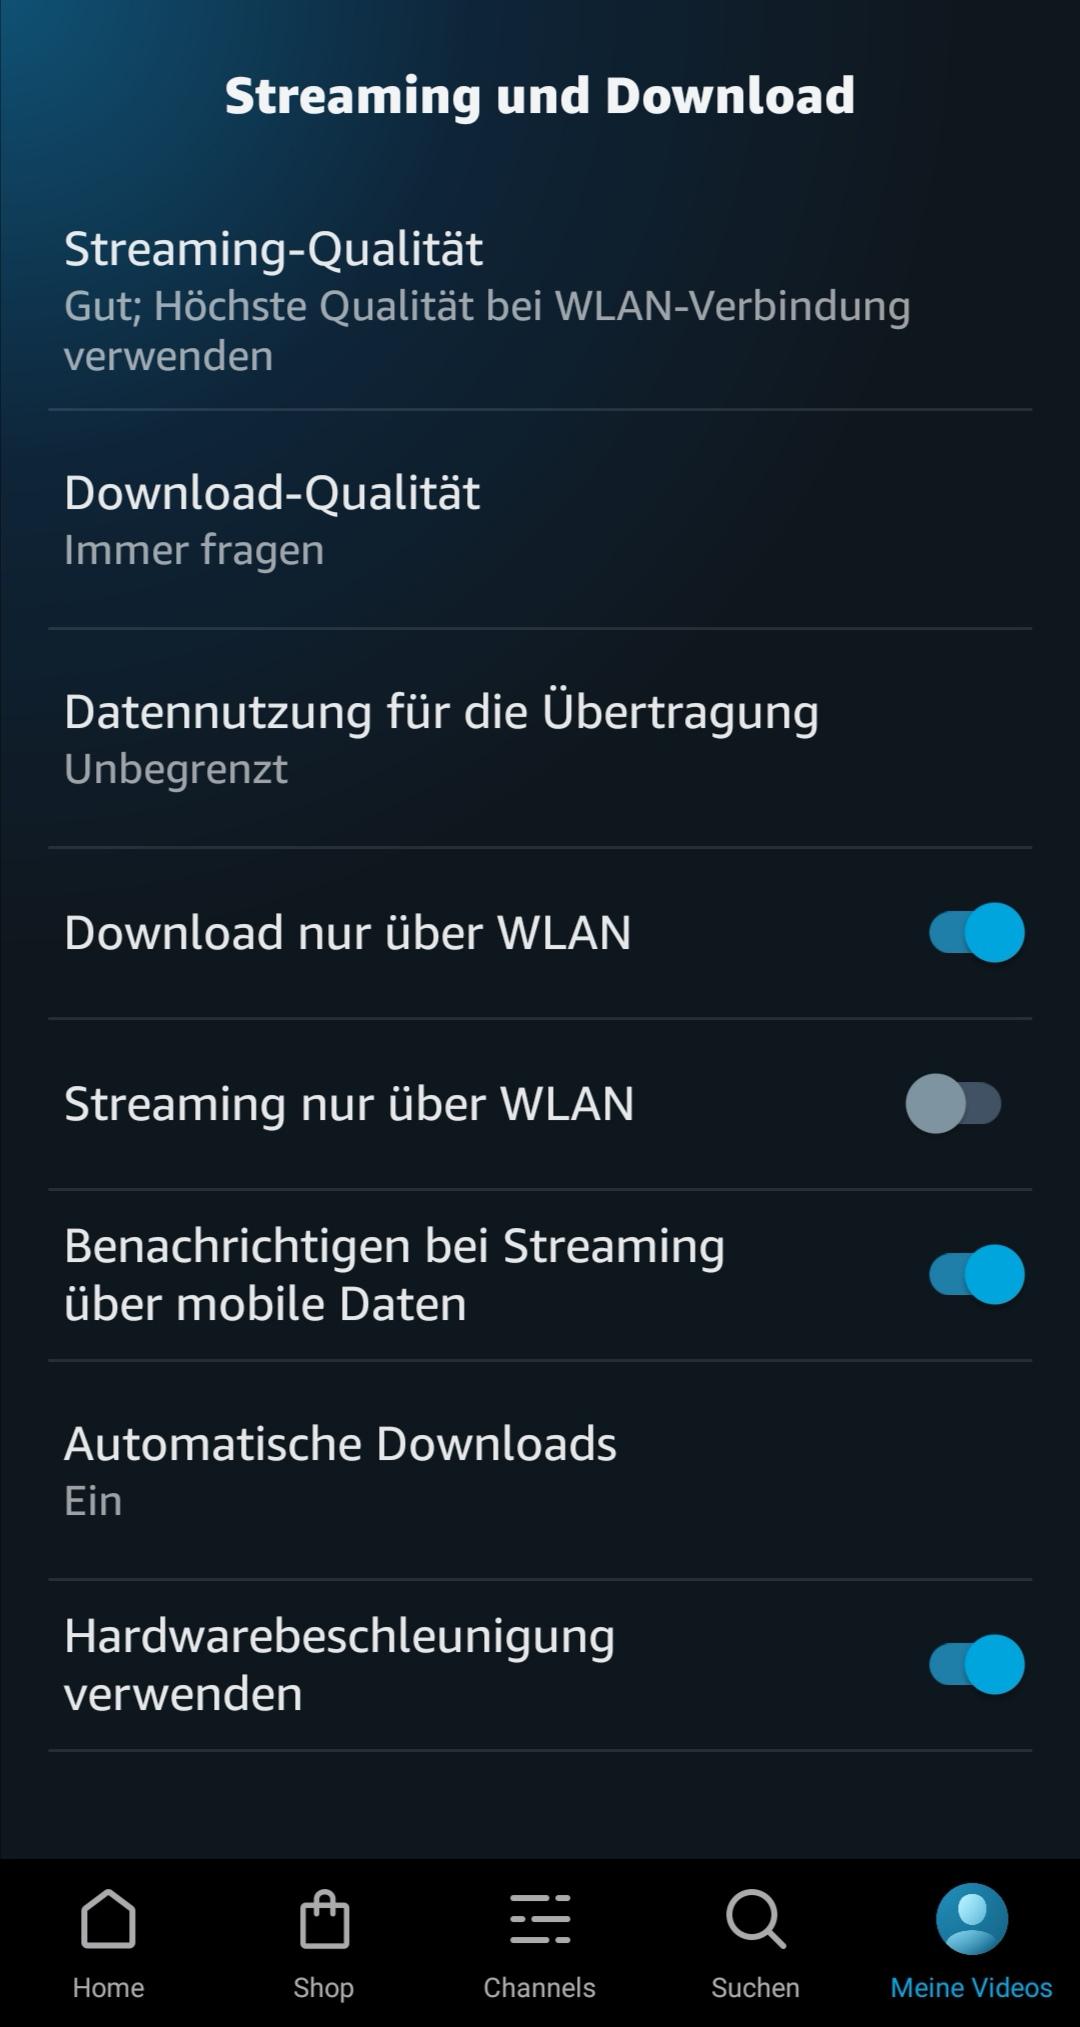 "Amazon Prime Video: ""Automatische Downloads"" in der Android App"